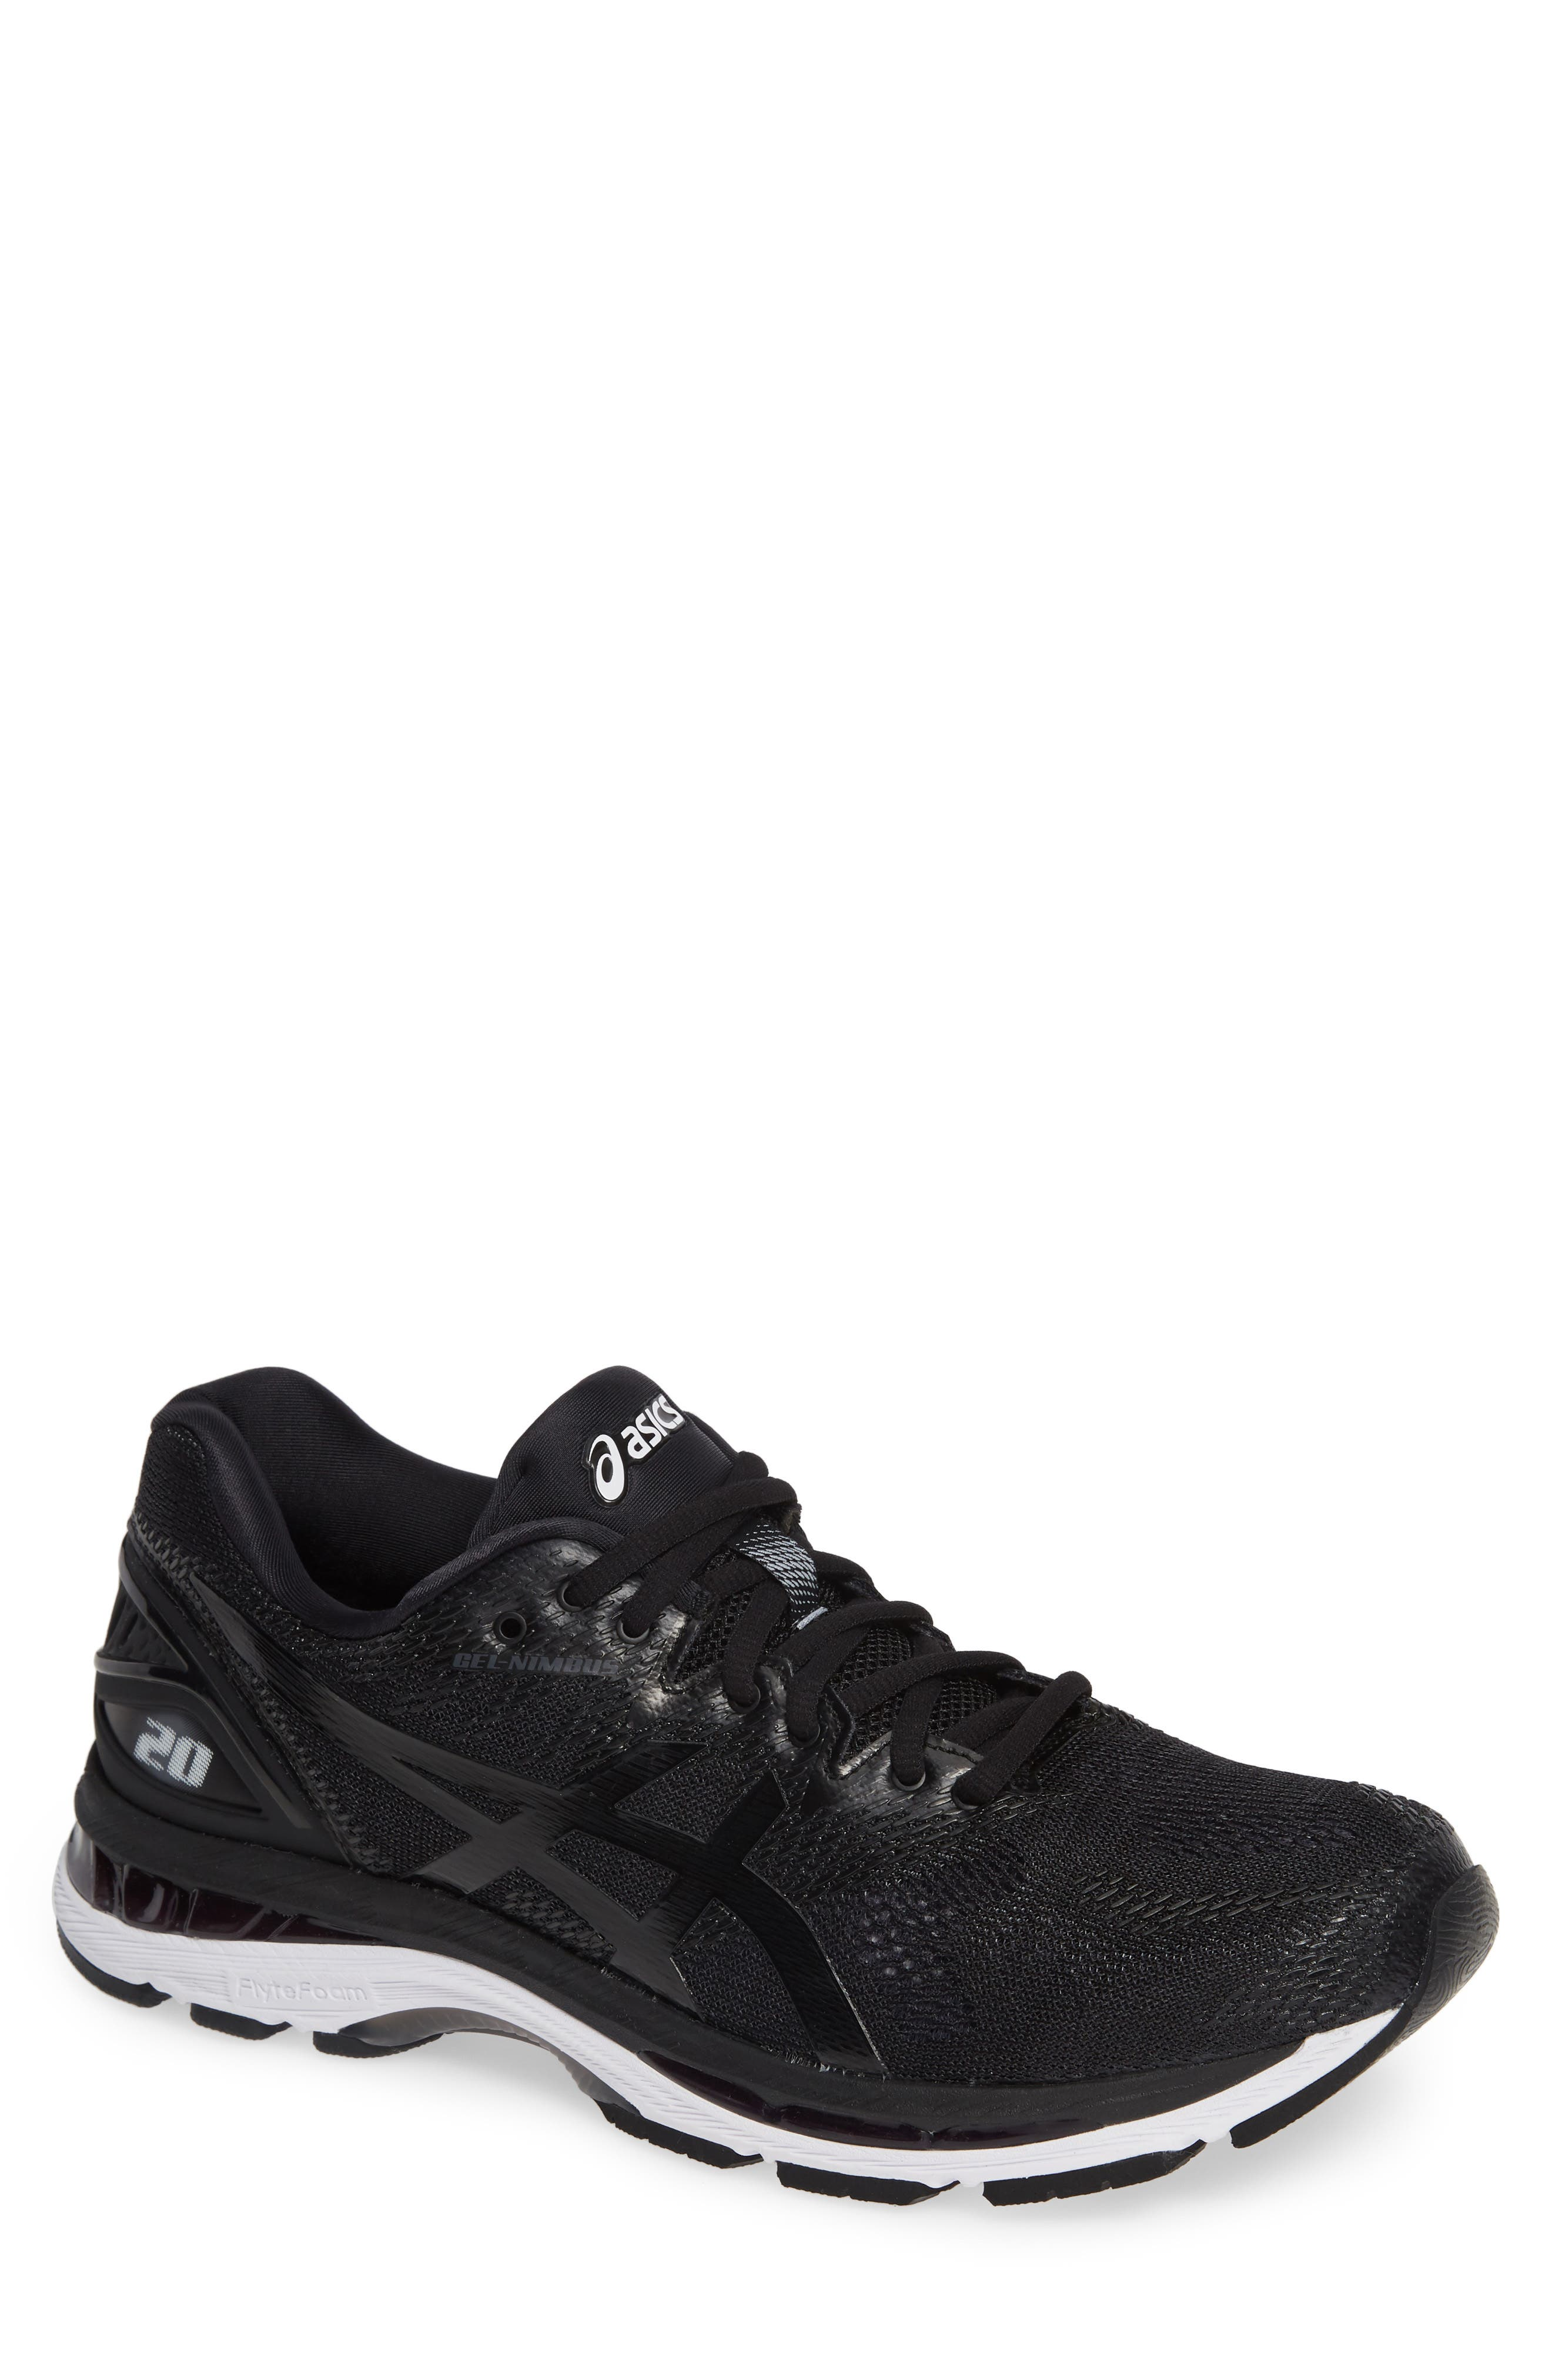 GEL<sup>®</sup>-Nimbus 20 Running Shoe,                             Main thumbnail 1, color,                             BLACK/ WHITE/ CARBON